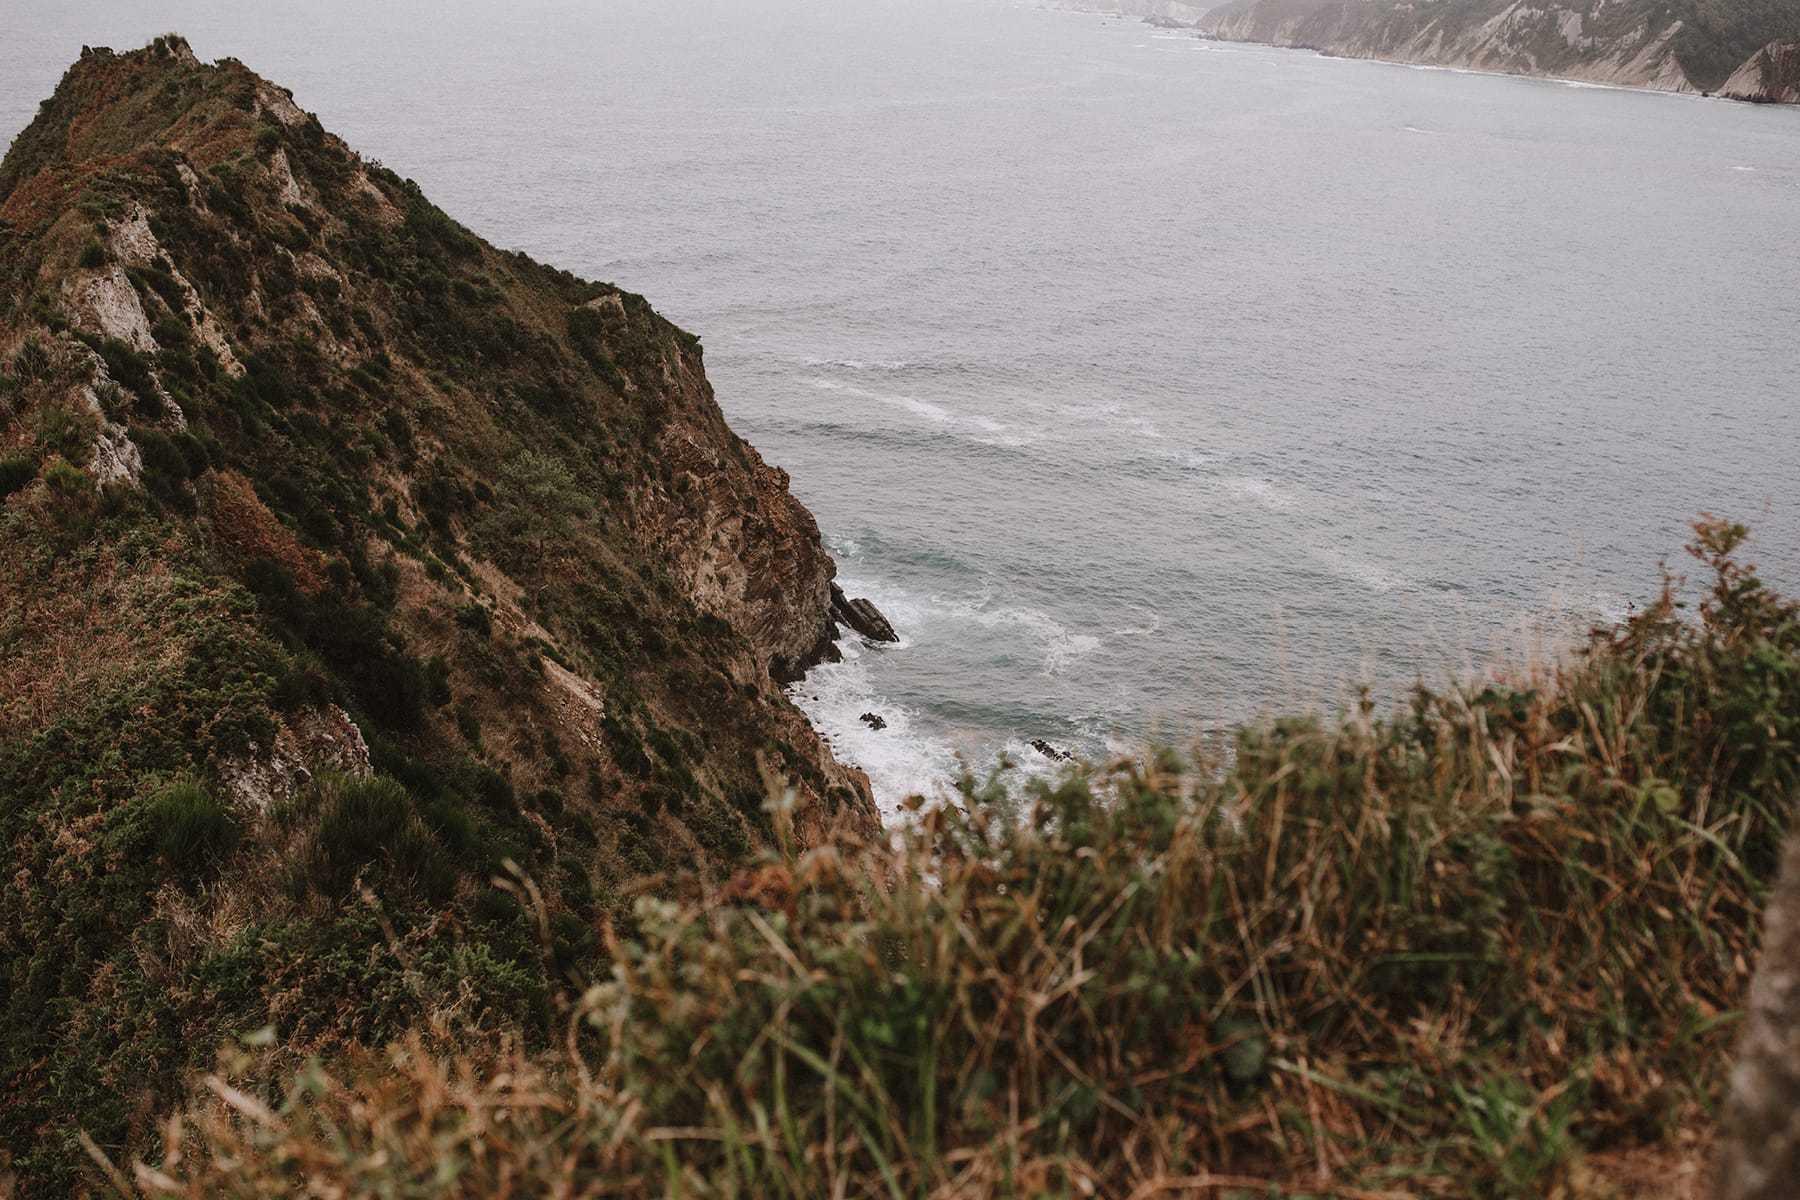 ermita_la_regalina_hilario_sanchez_fotografo_boda_asturias_010